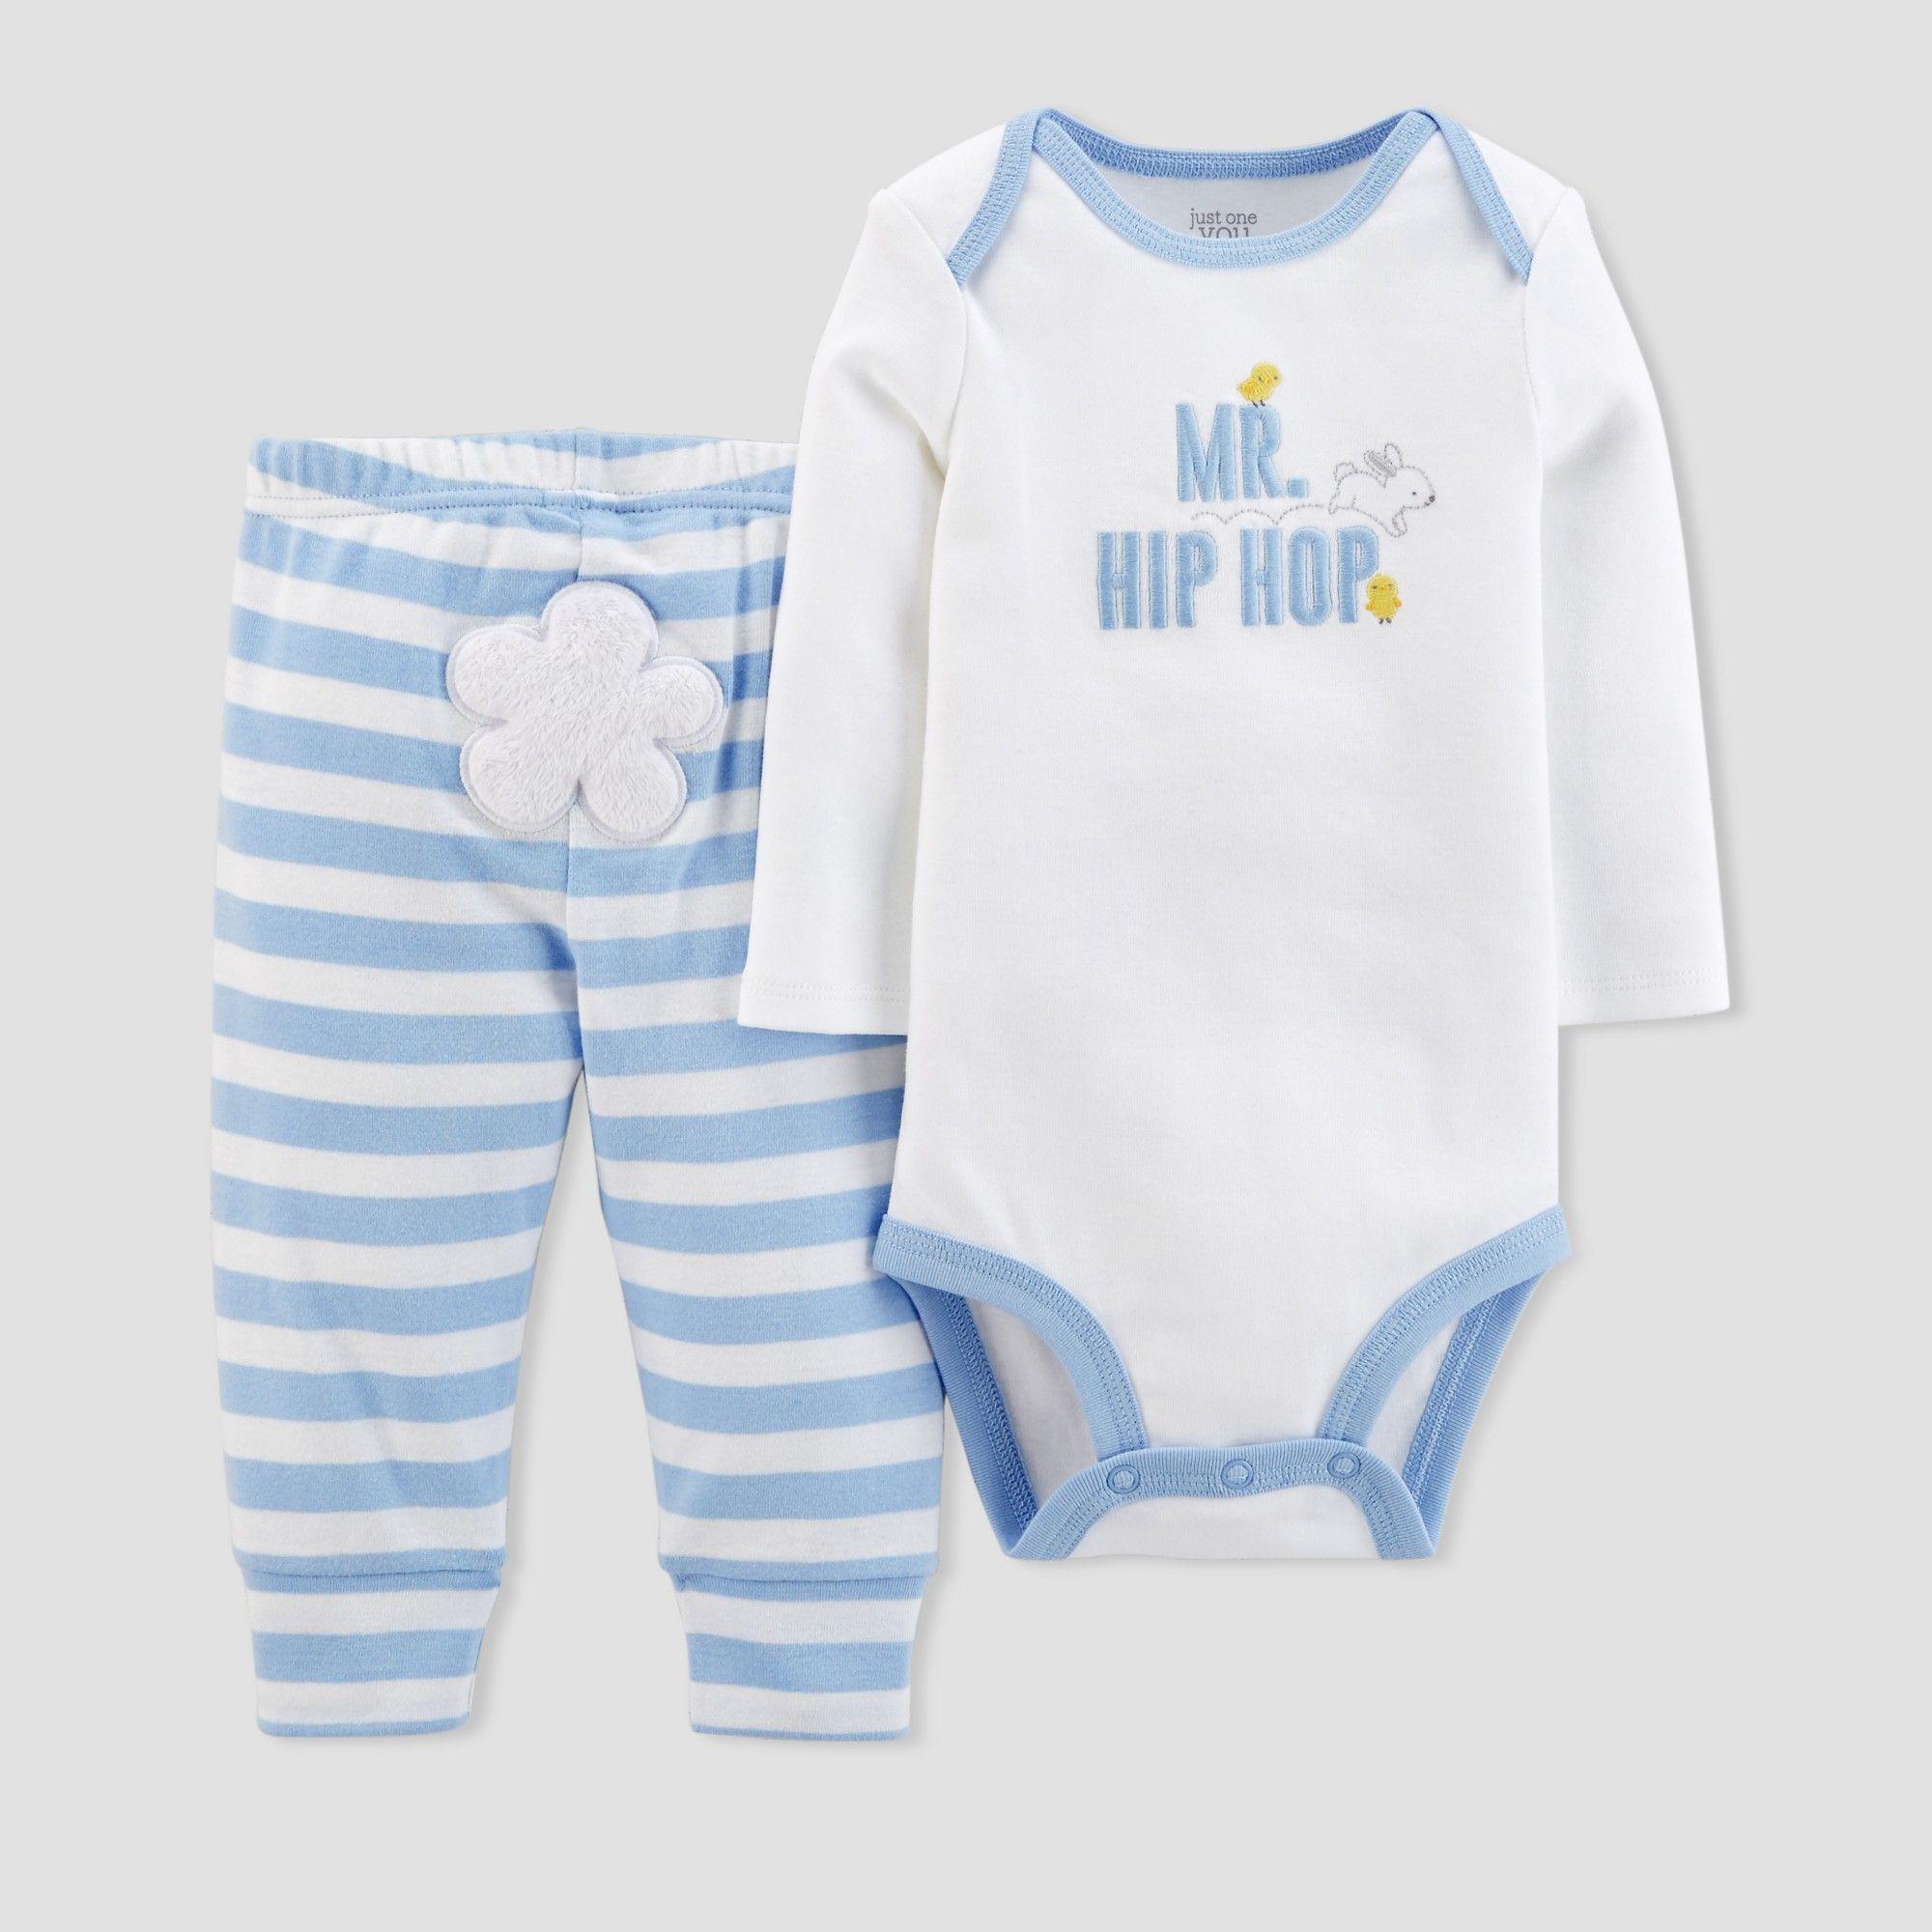 The Beatles Lyrics Infant Baby Boys 5 Pack Onesies Blue White Grey Navy Red